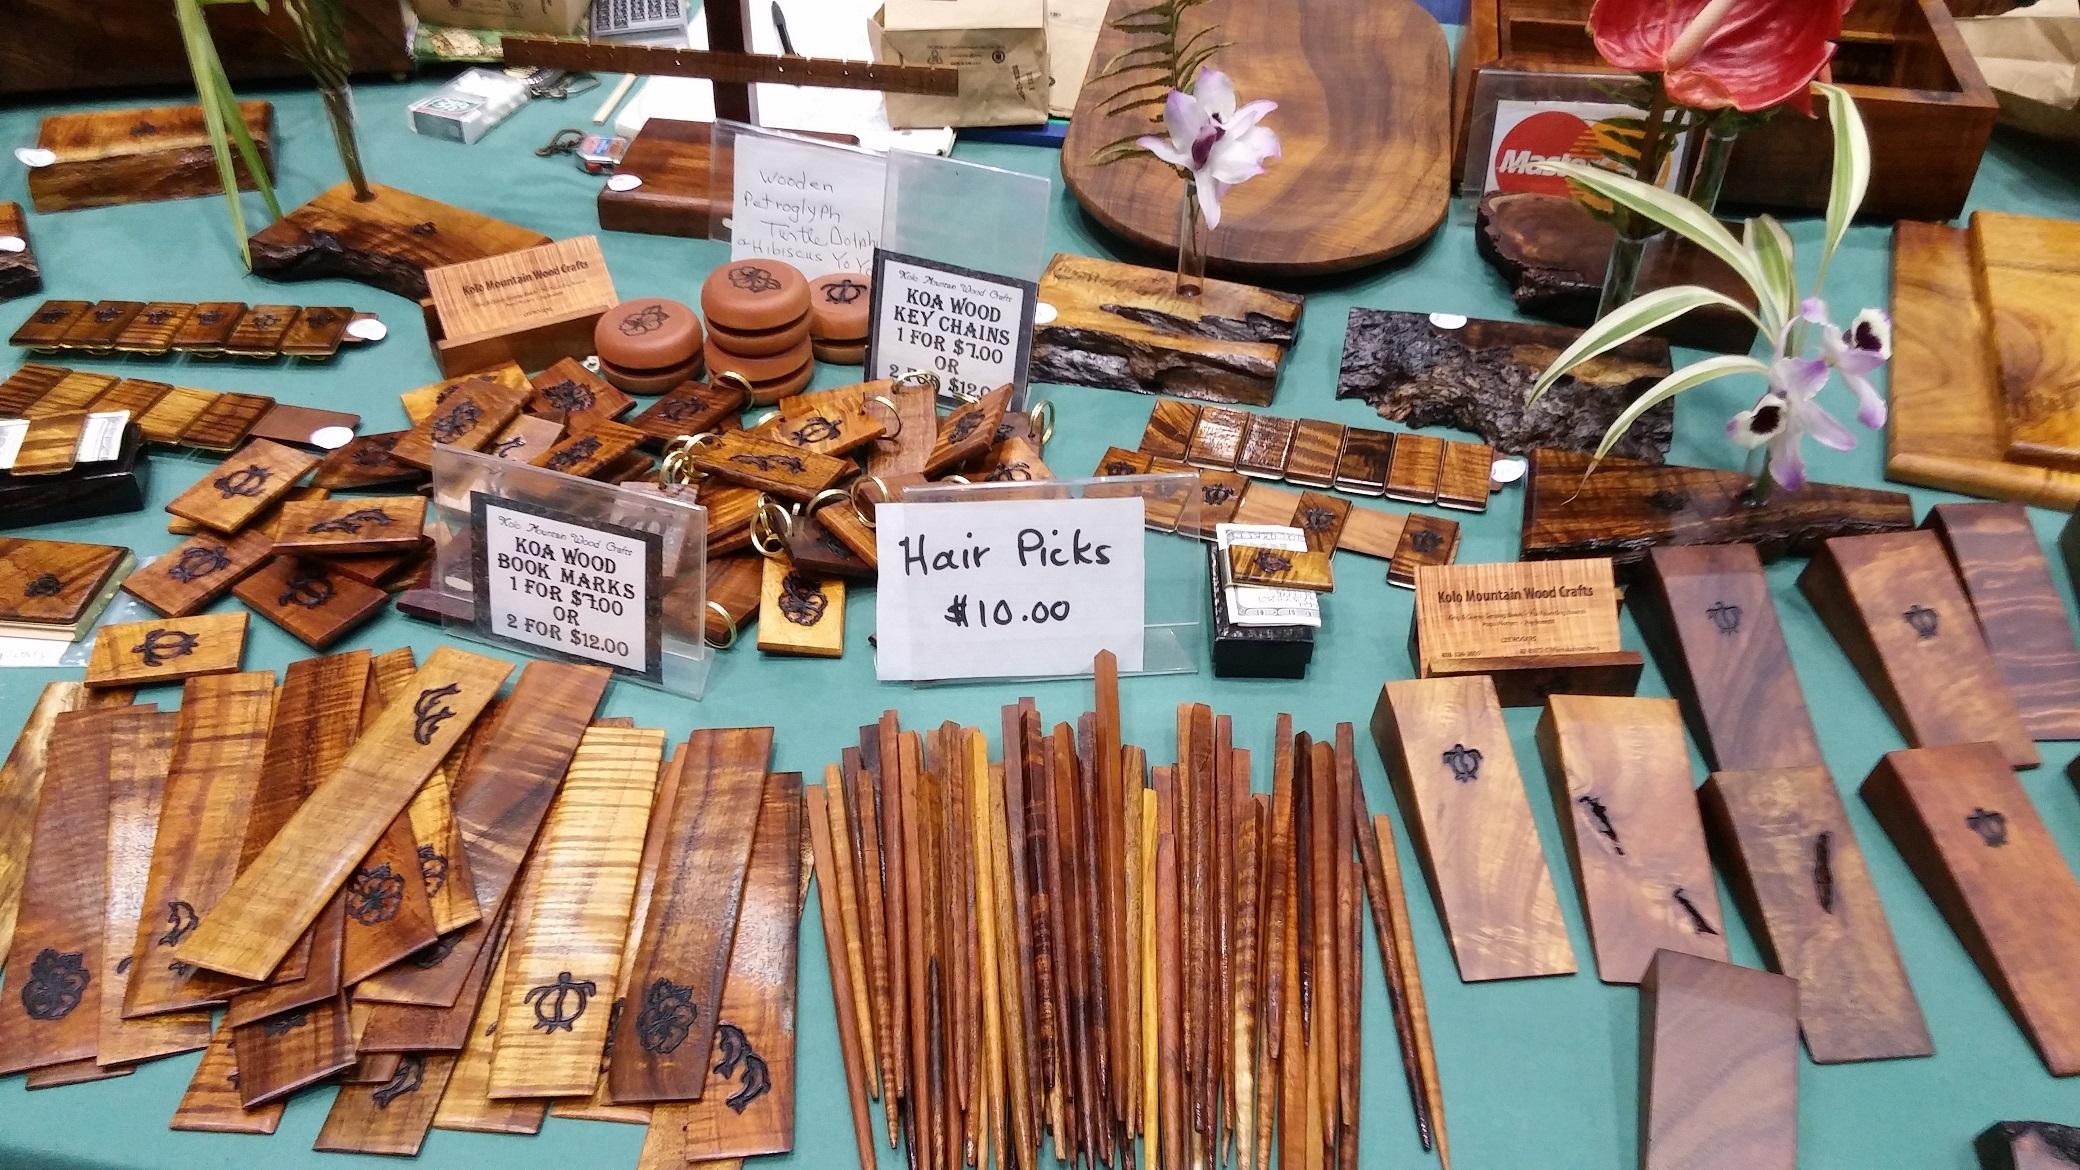 Kolo Mountain Wood Crafts. Photo credit: Marla Walters.